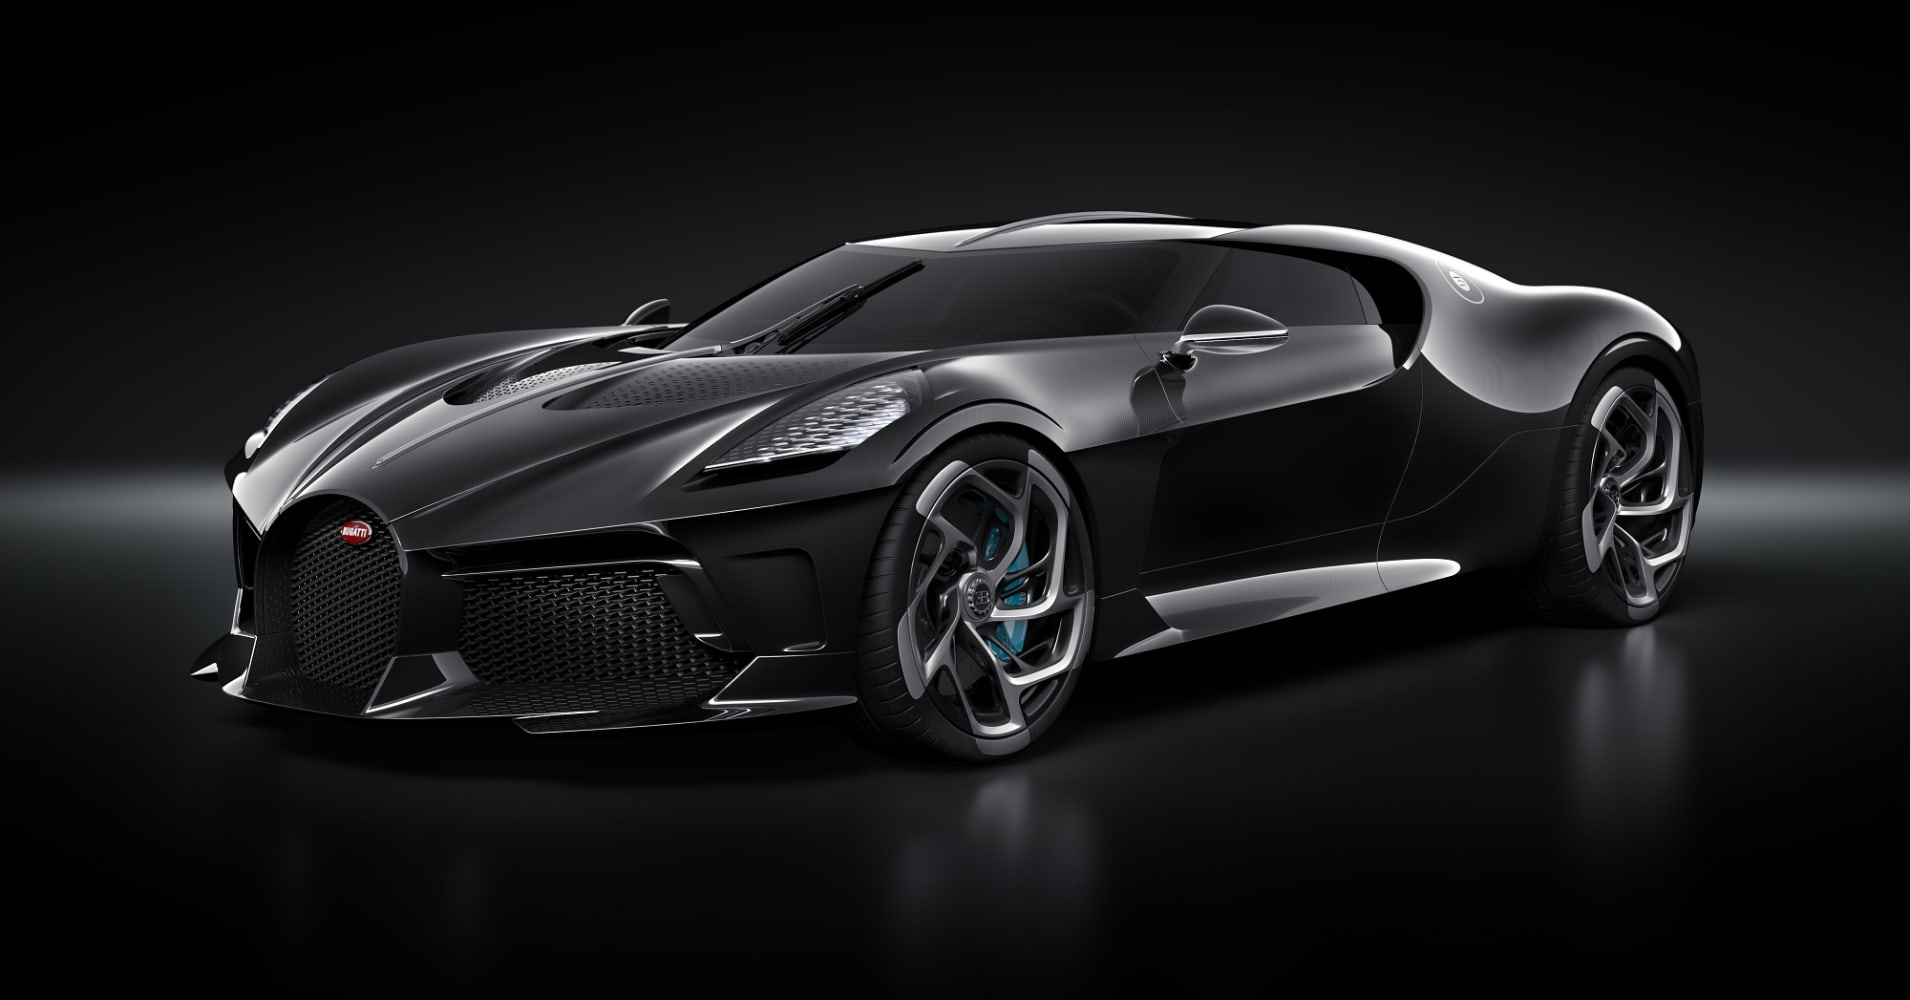 Take A Look: Bugatti's La Voiture Noire Car Just Sold For